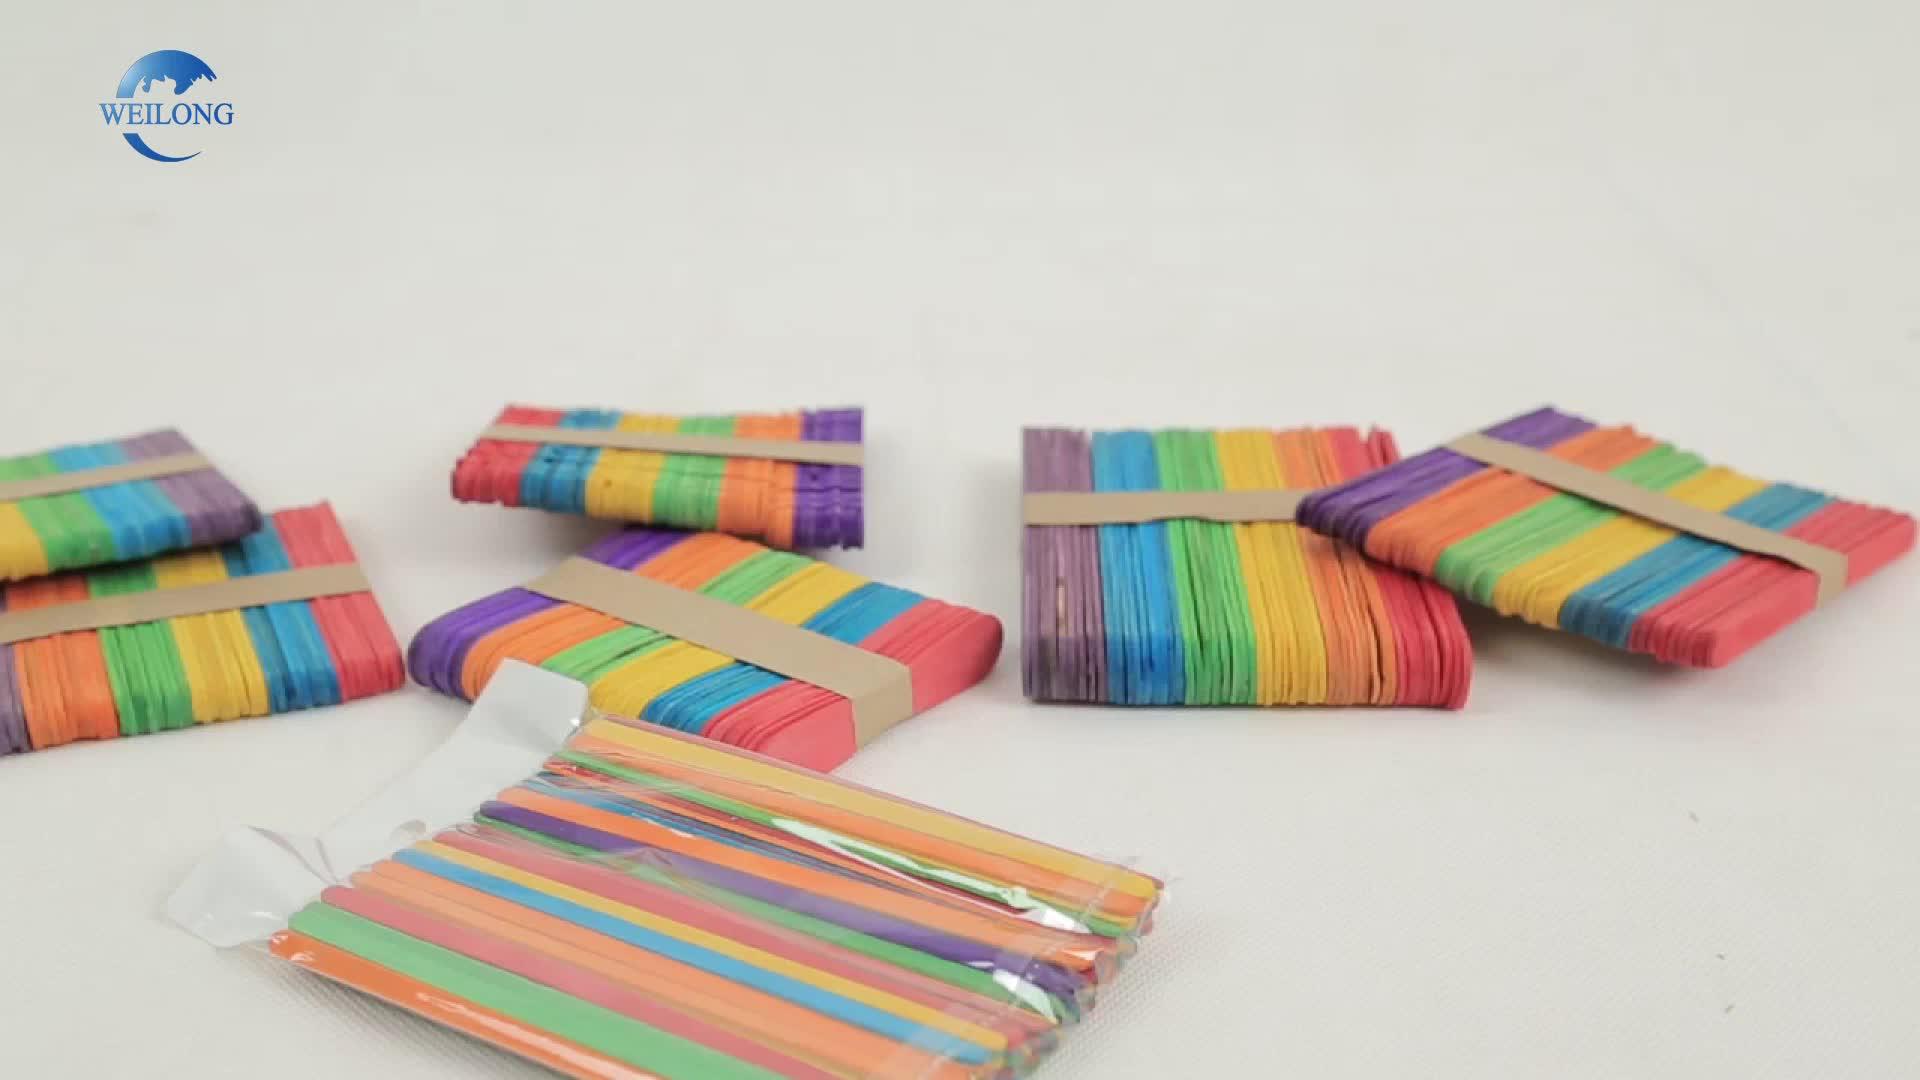 Tongkat Warna-warni Kerajinan Kayu Tongkat Es Krim Es Loli Kayu untuk Kerajinan Tangan